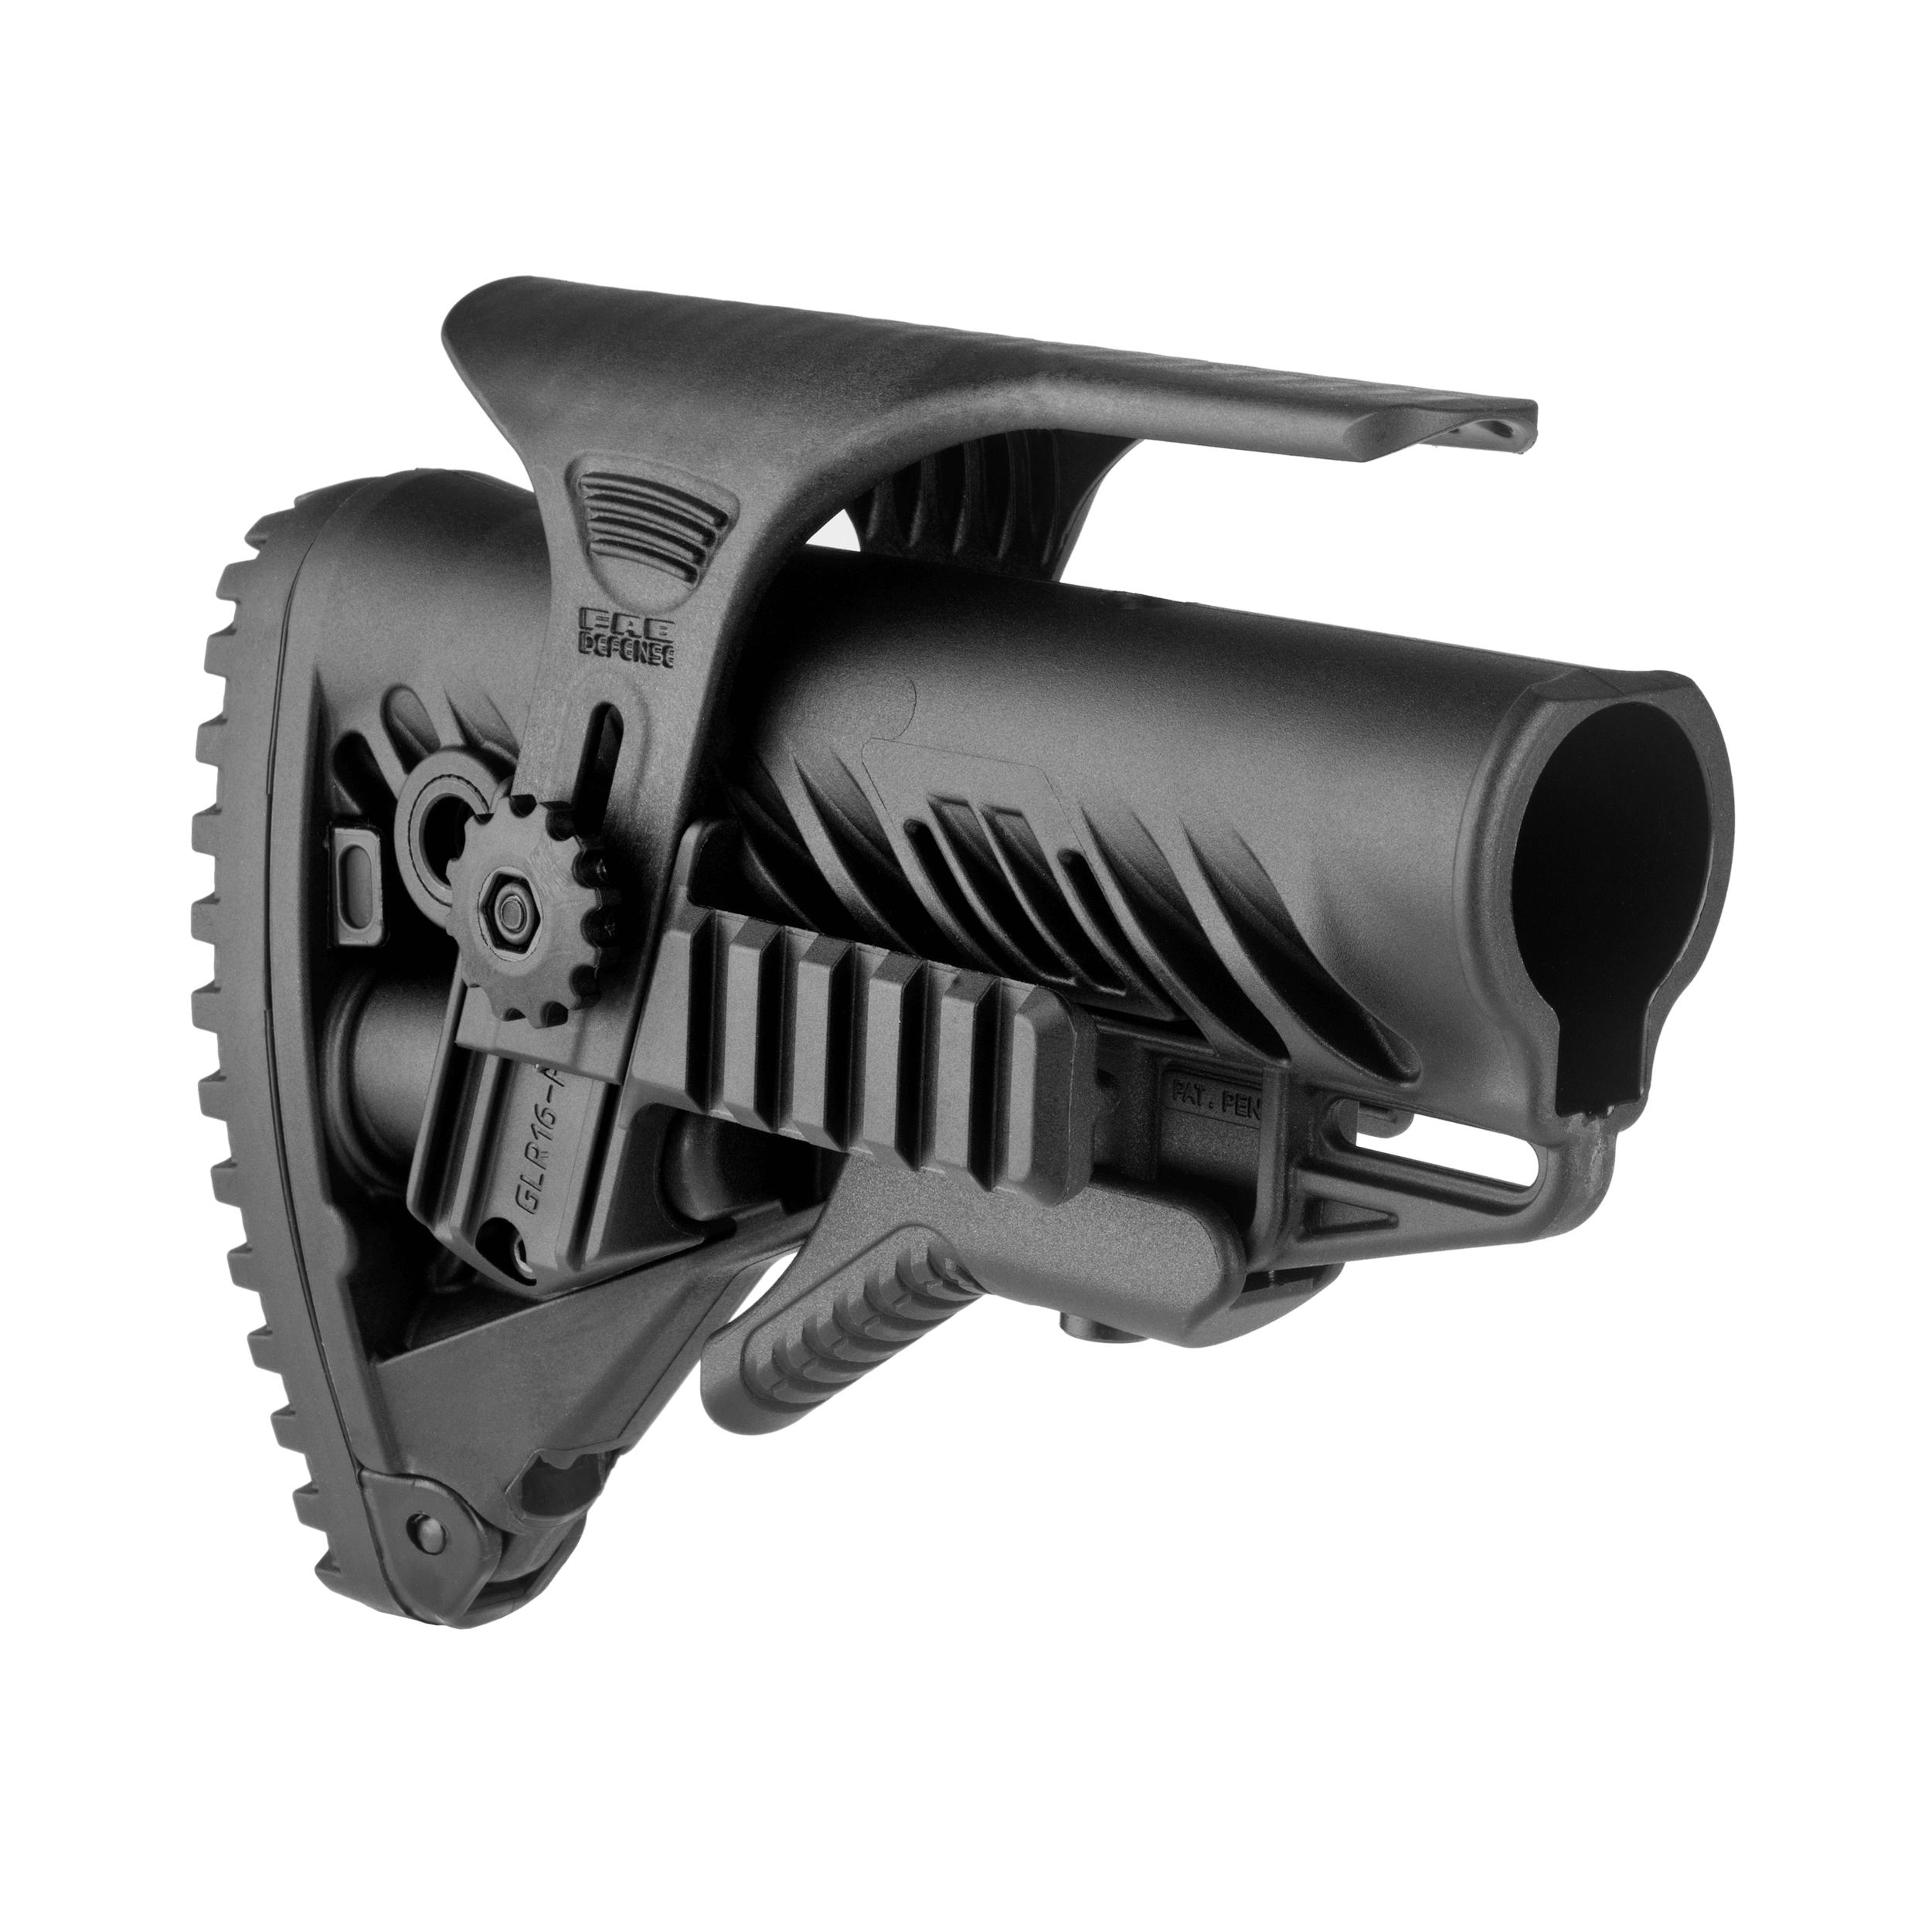 Buttstock AR15 / M16 / M4 Style - Cheek Rest / Rail